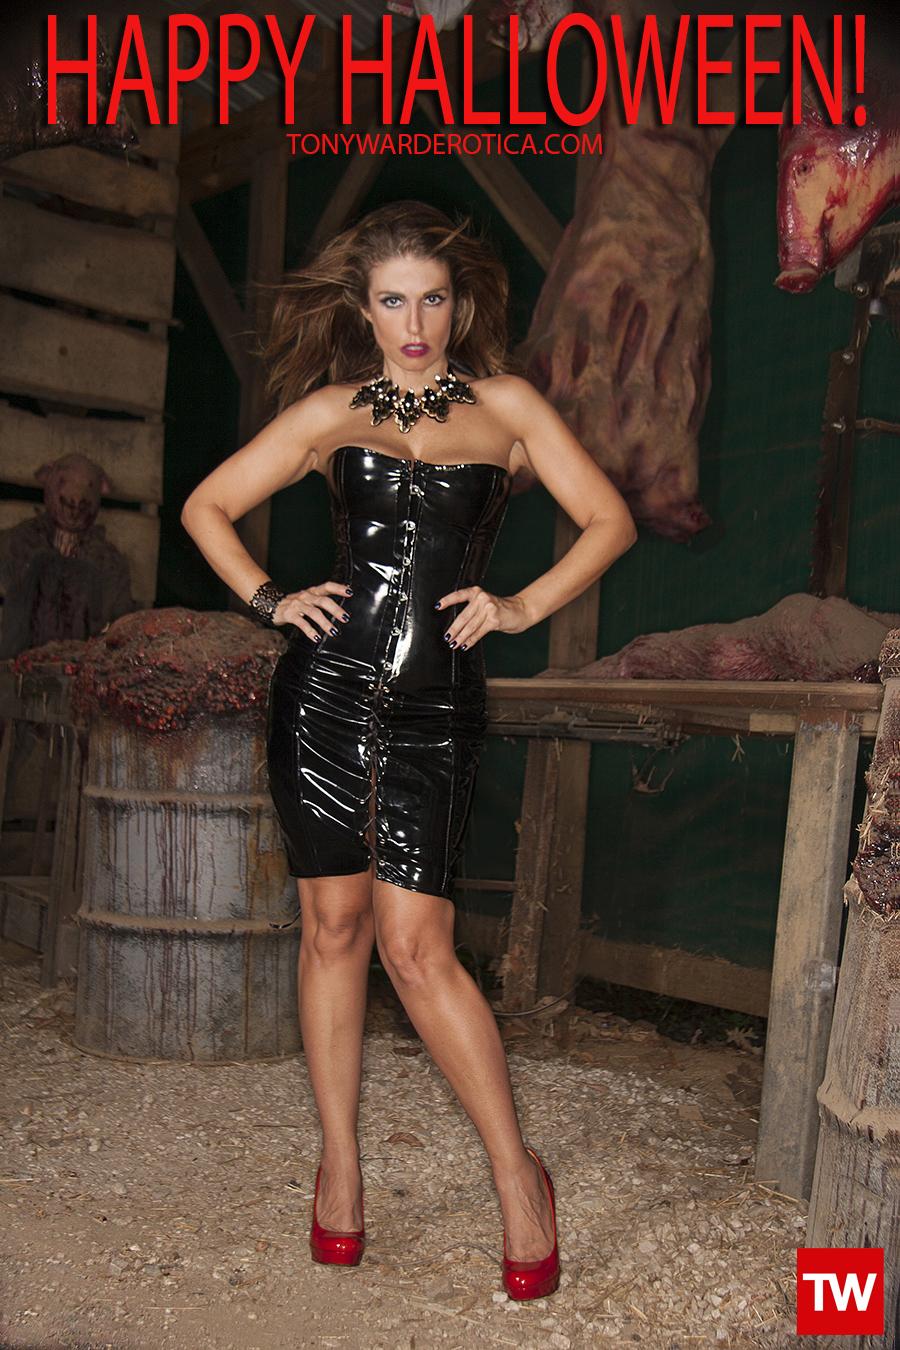 Tony_Ward_Photography_studio_Happy_Halloween_Model_Jennifer_Grabel_Bates_Motel